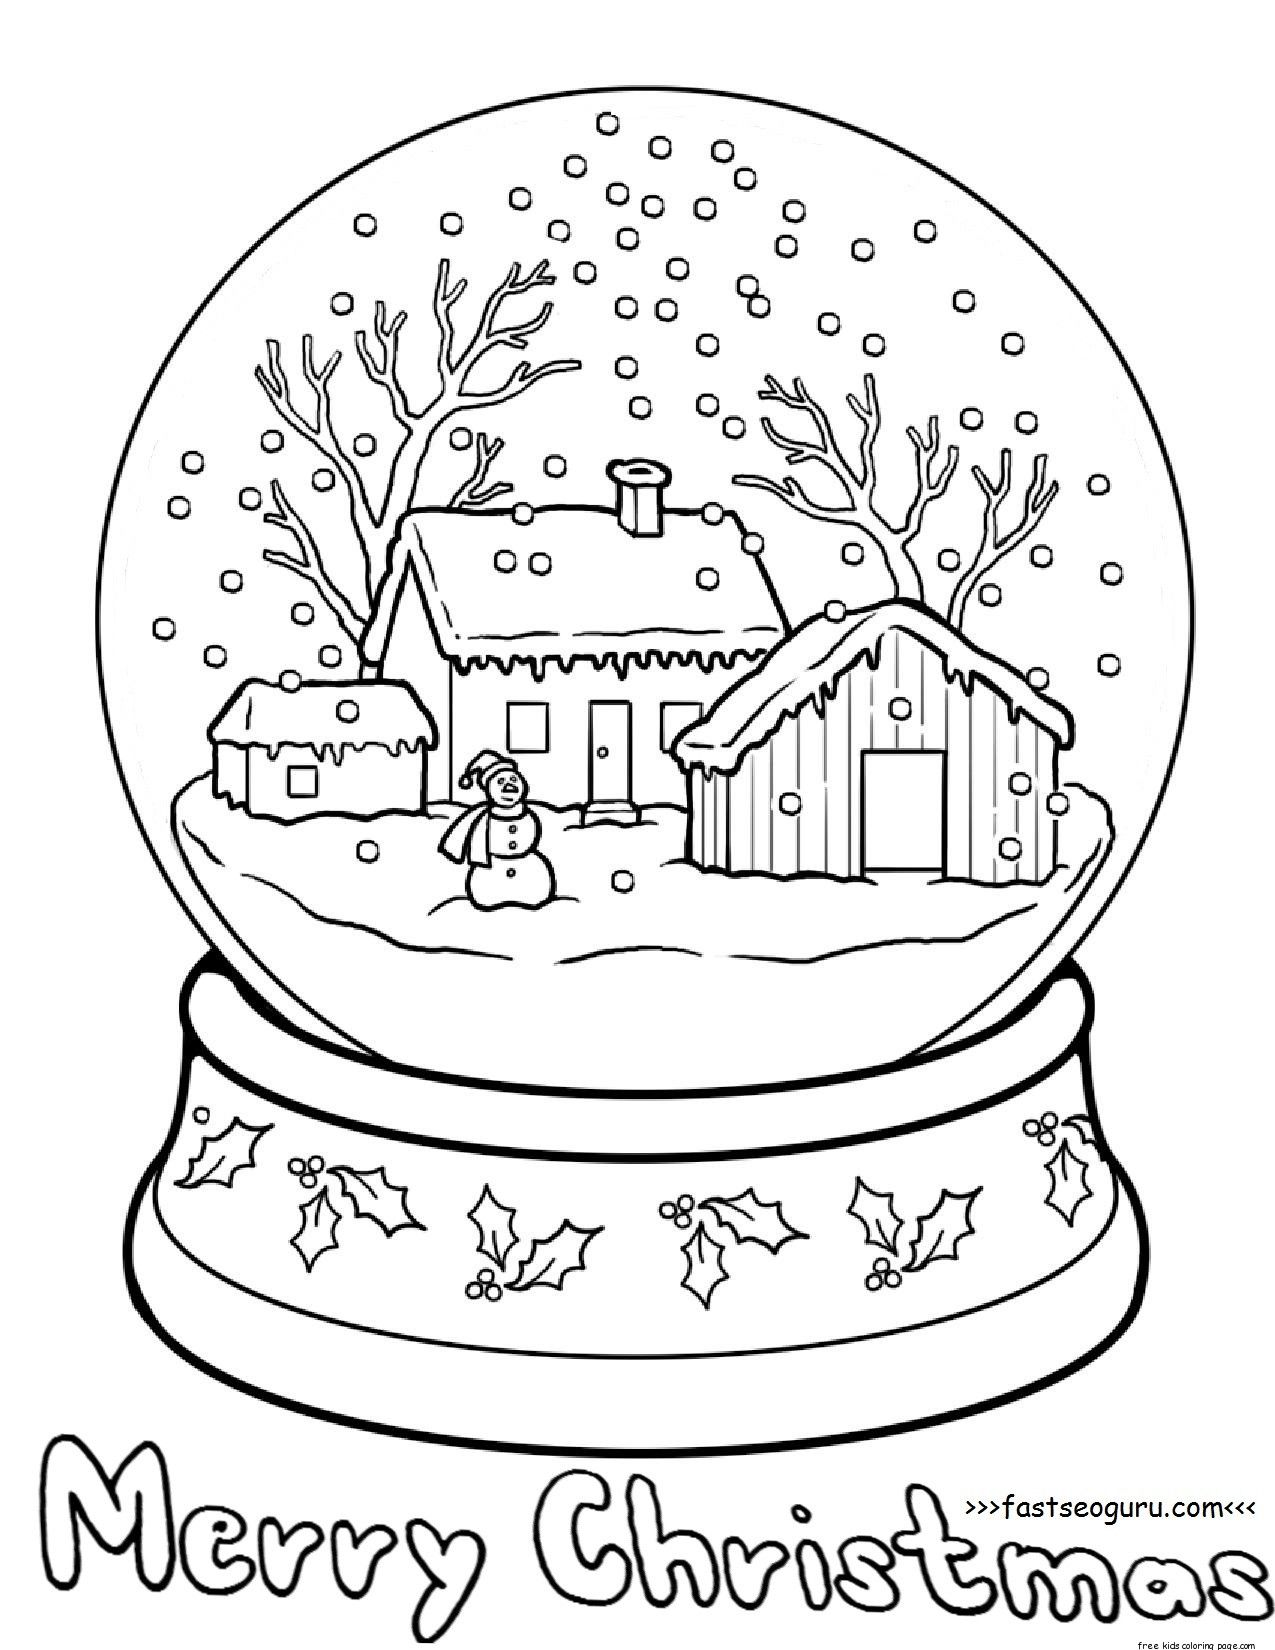 Snow Globe Coloring Page Globe Coloring Page  Cmscorpion  Grandma  Pinterest  Globe